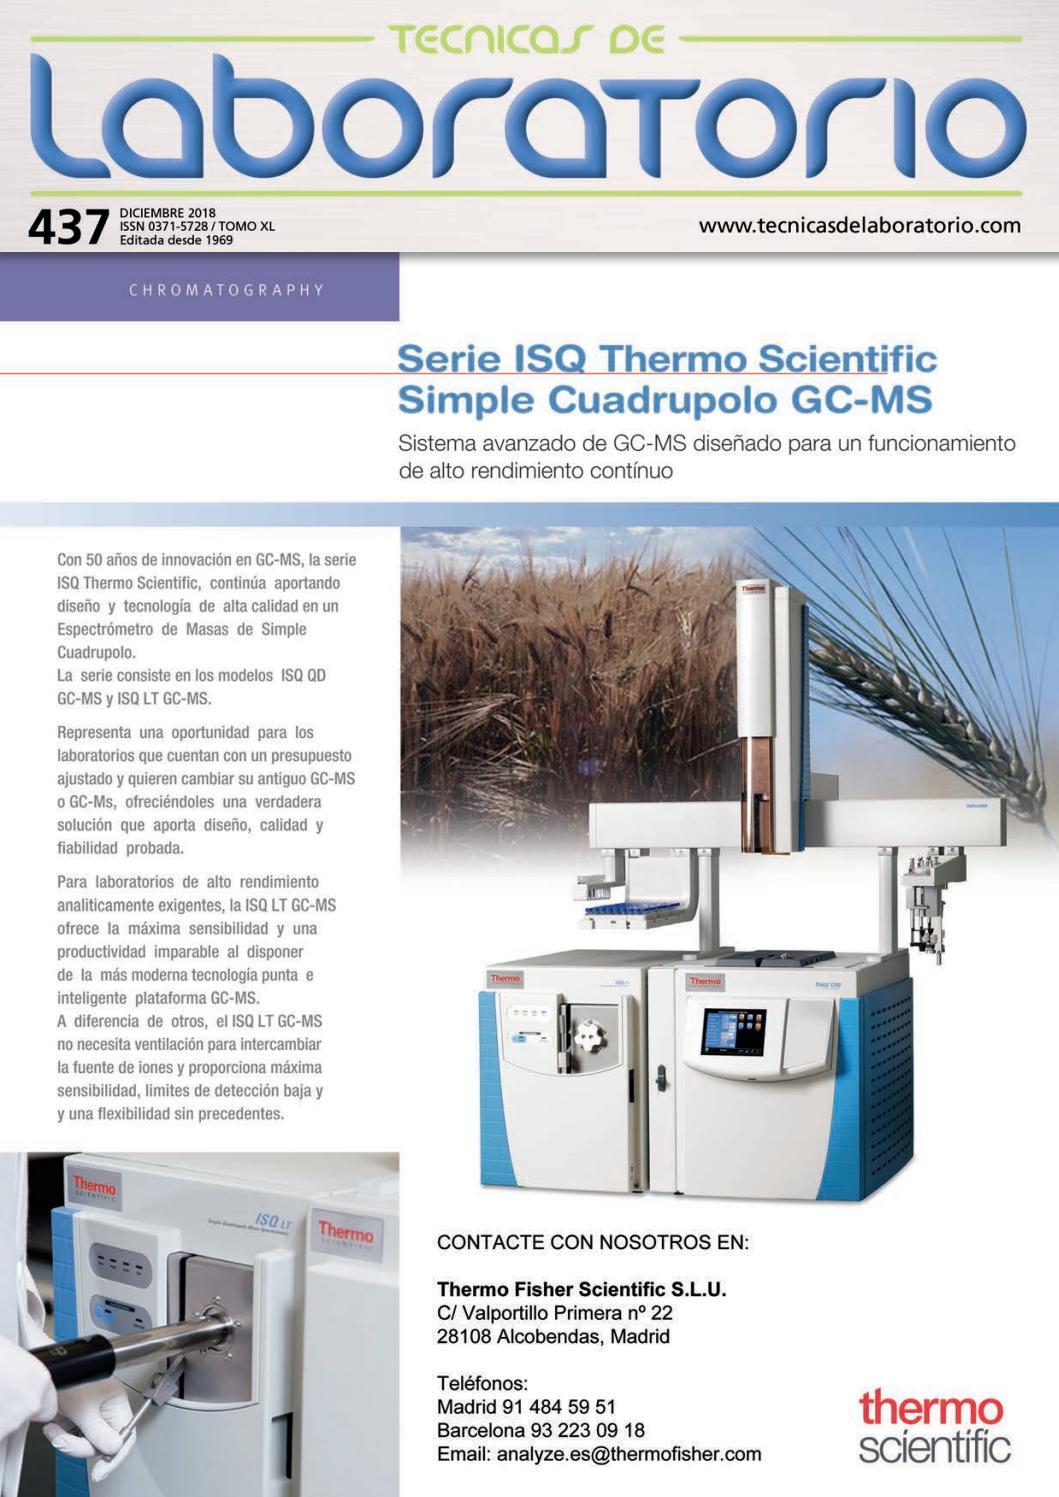 Tecnicas de Laboratorio nº 437 by Publica SL - issuu